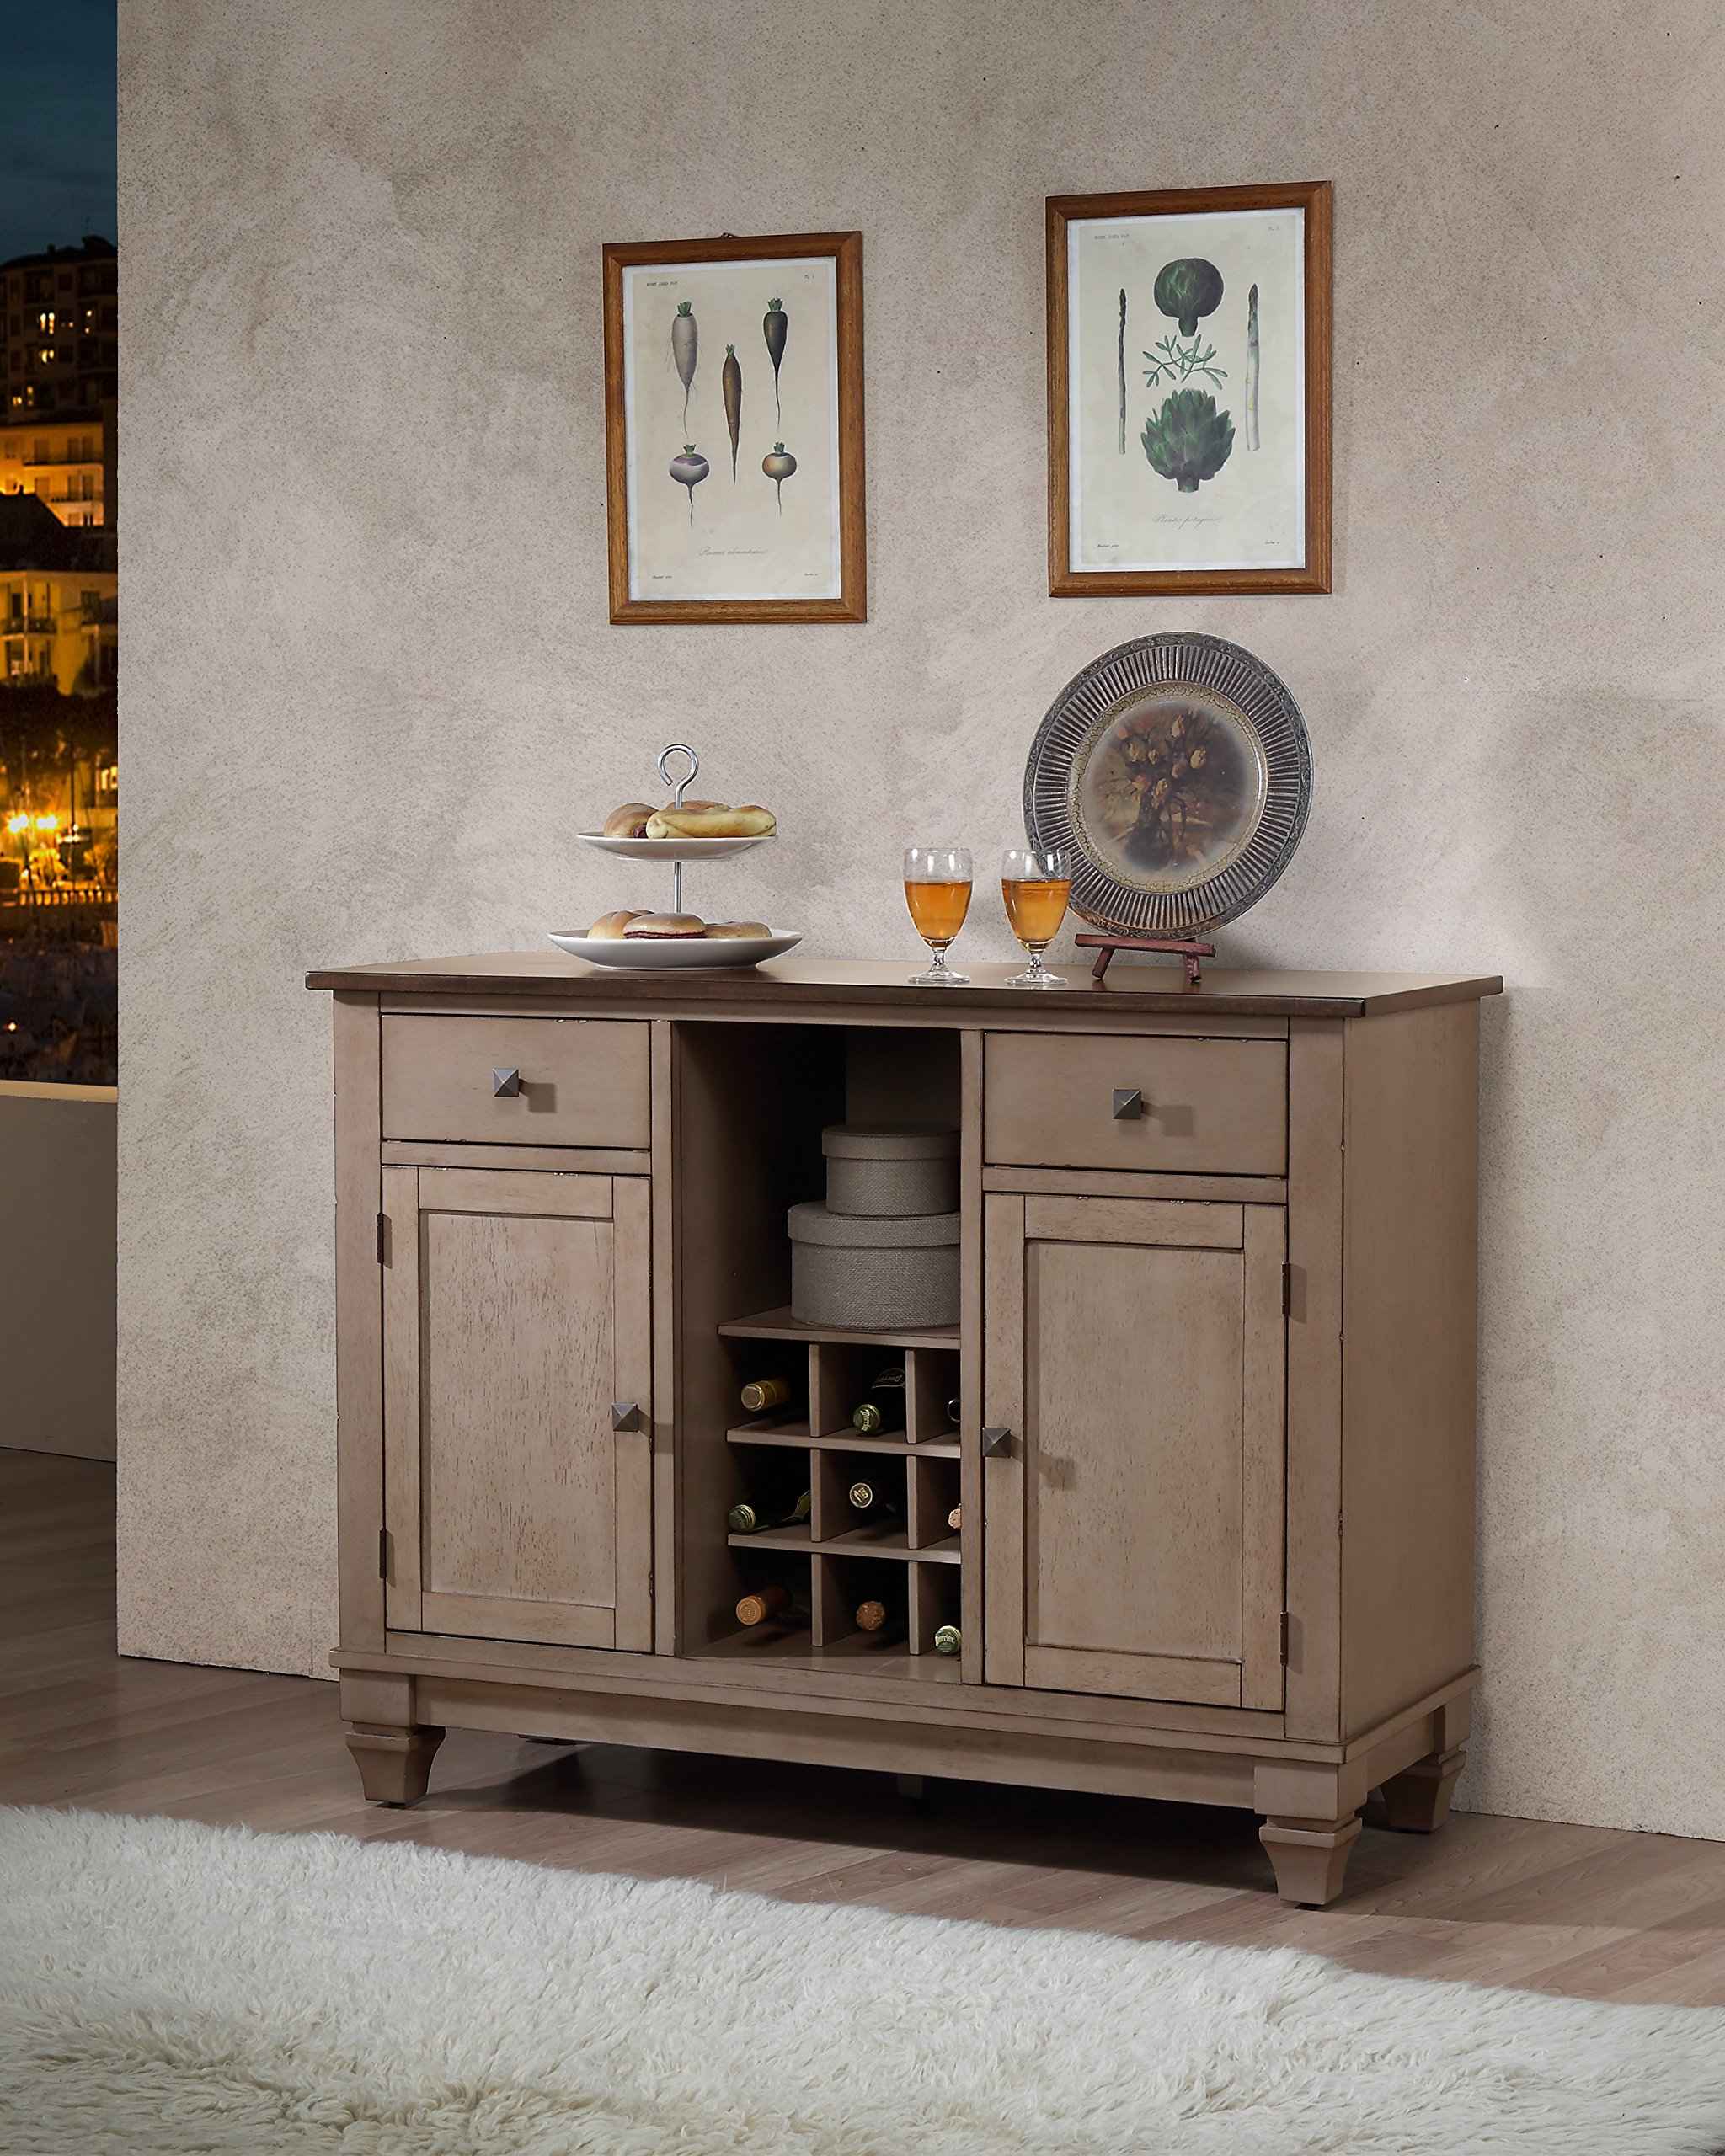 Kings Brand Almon 2-Tone Brown Wood Wine Rack Sideboard Buffet Server Storage Cabinet with Drawers, Shelf and Doors